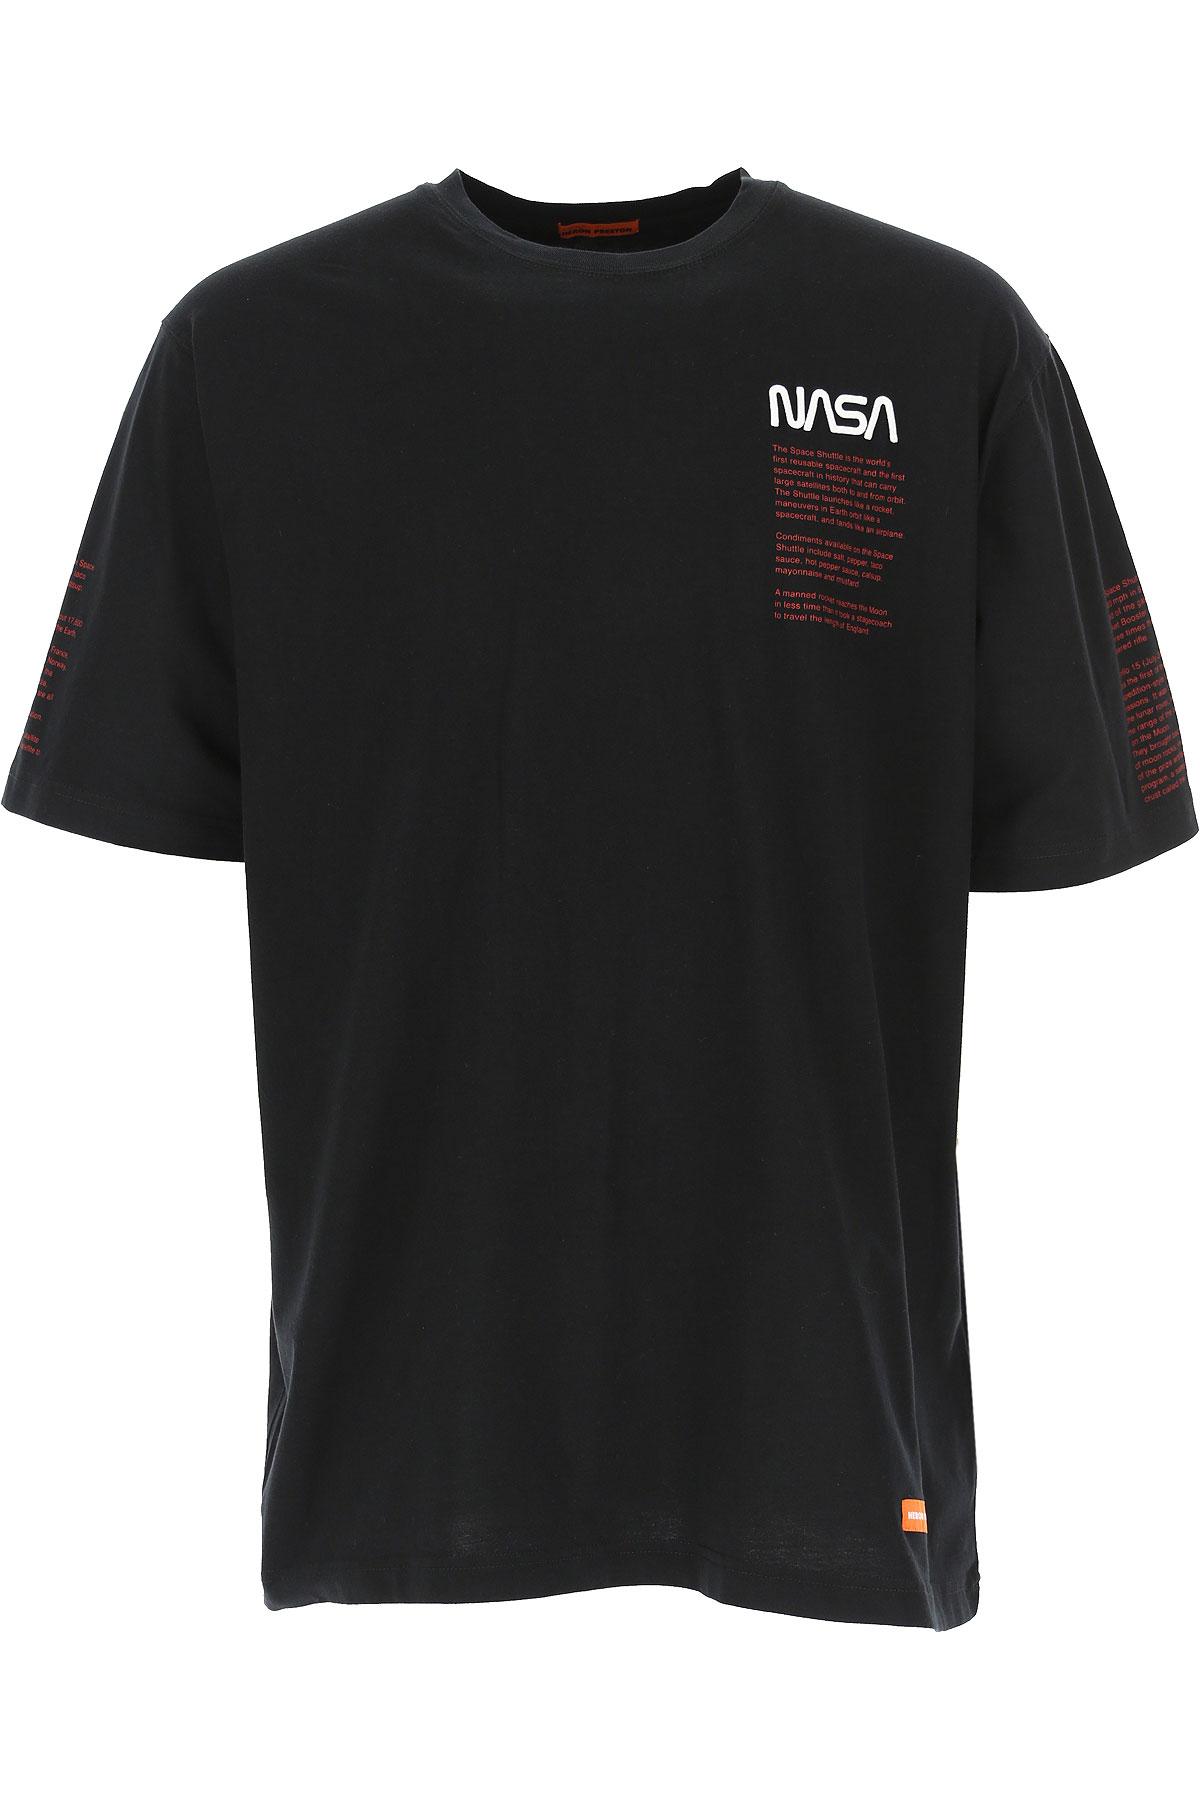 Heron Preston T-Shirt for Men, Black, Cotton, 2019, L M